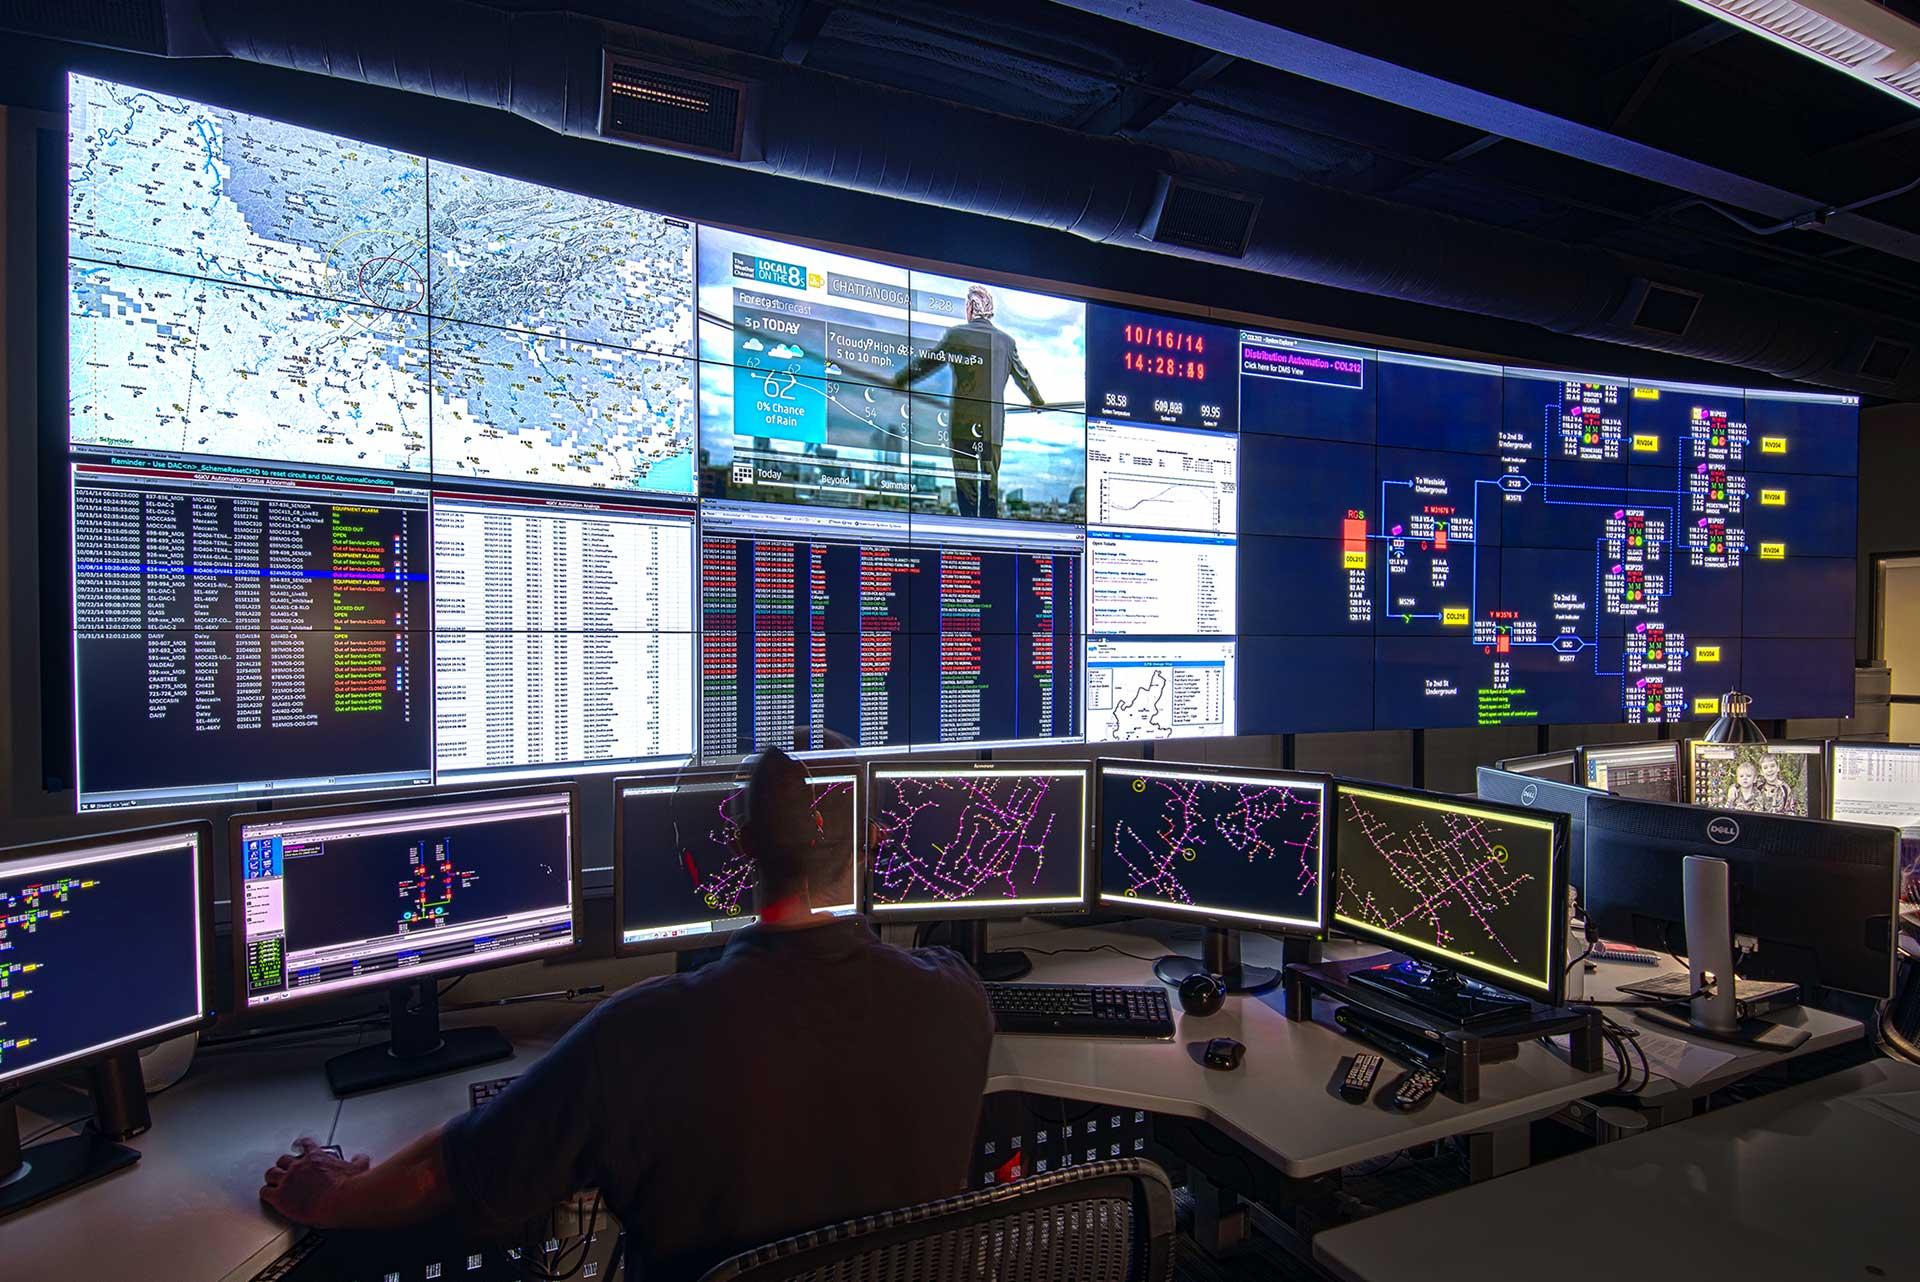 Electric Power Board (EPB) Image